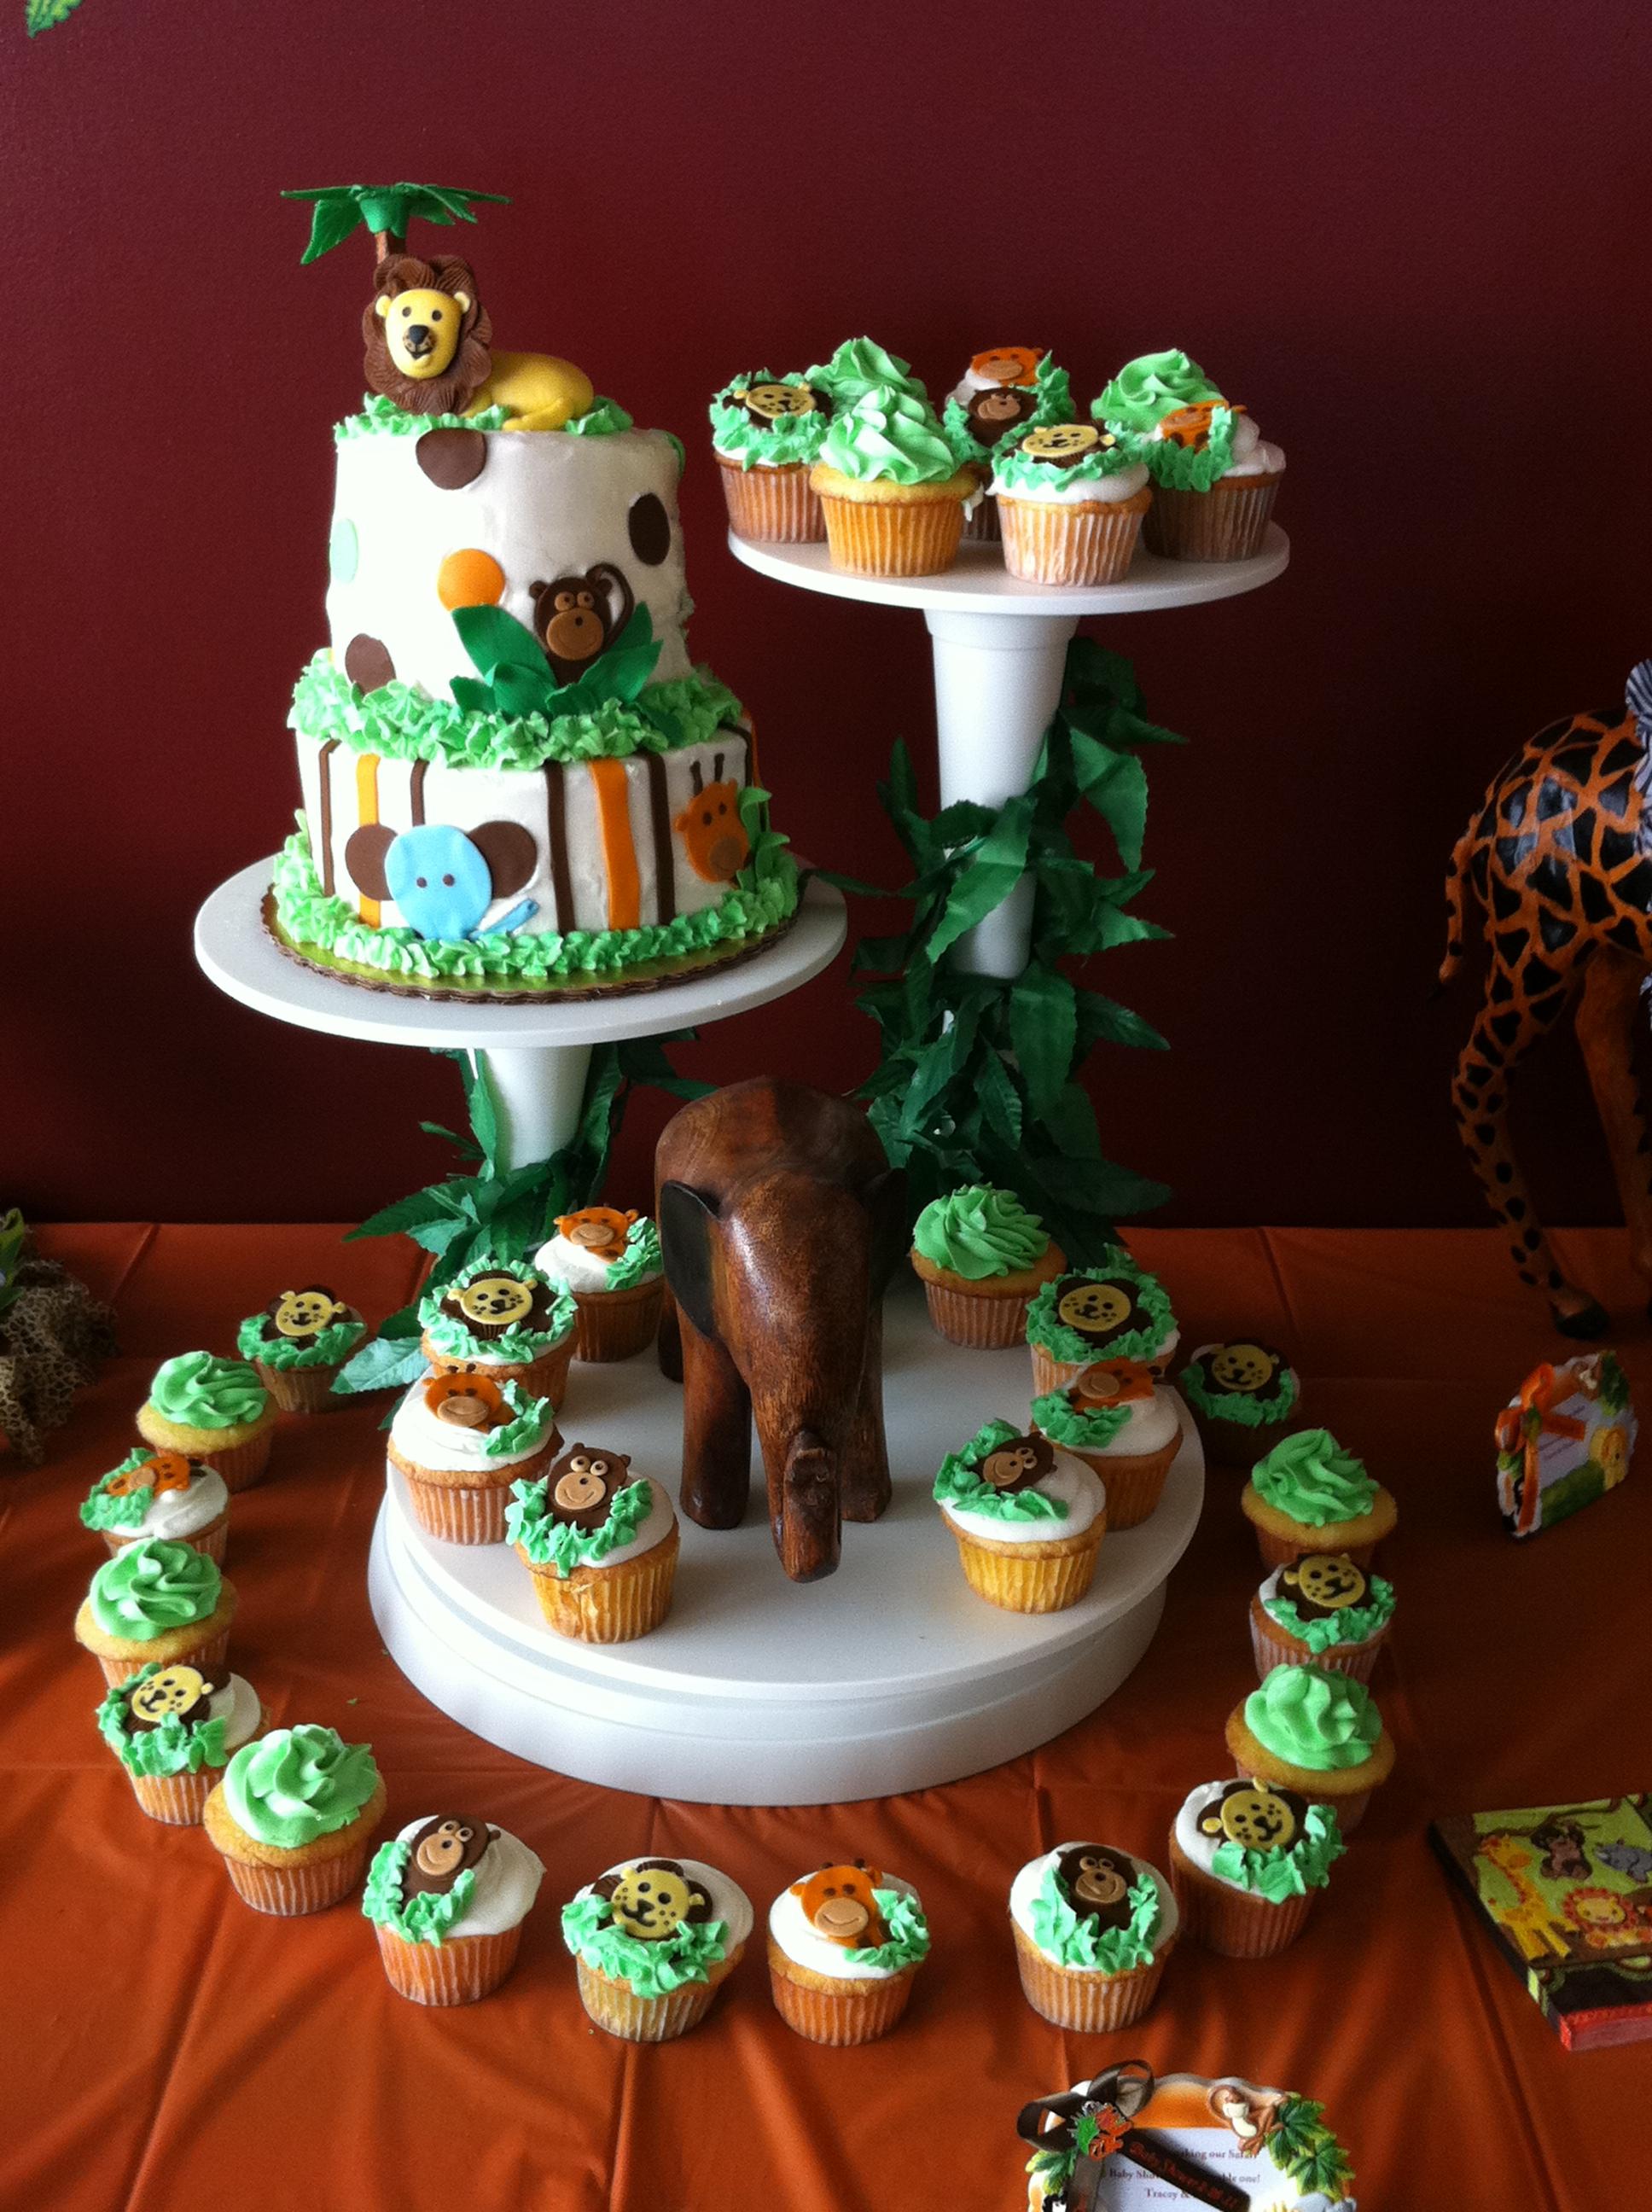 10 Spectacular Safari Jungle Baby Shower Ideas photo baby shower cakes 4 image 2021